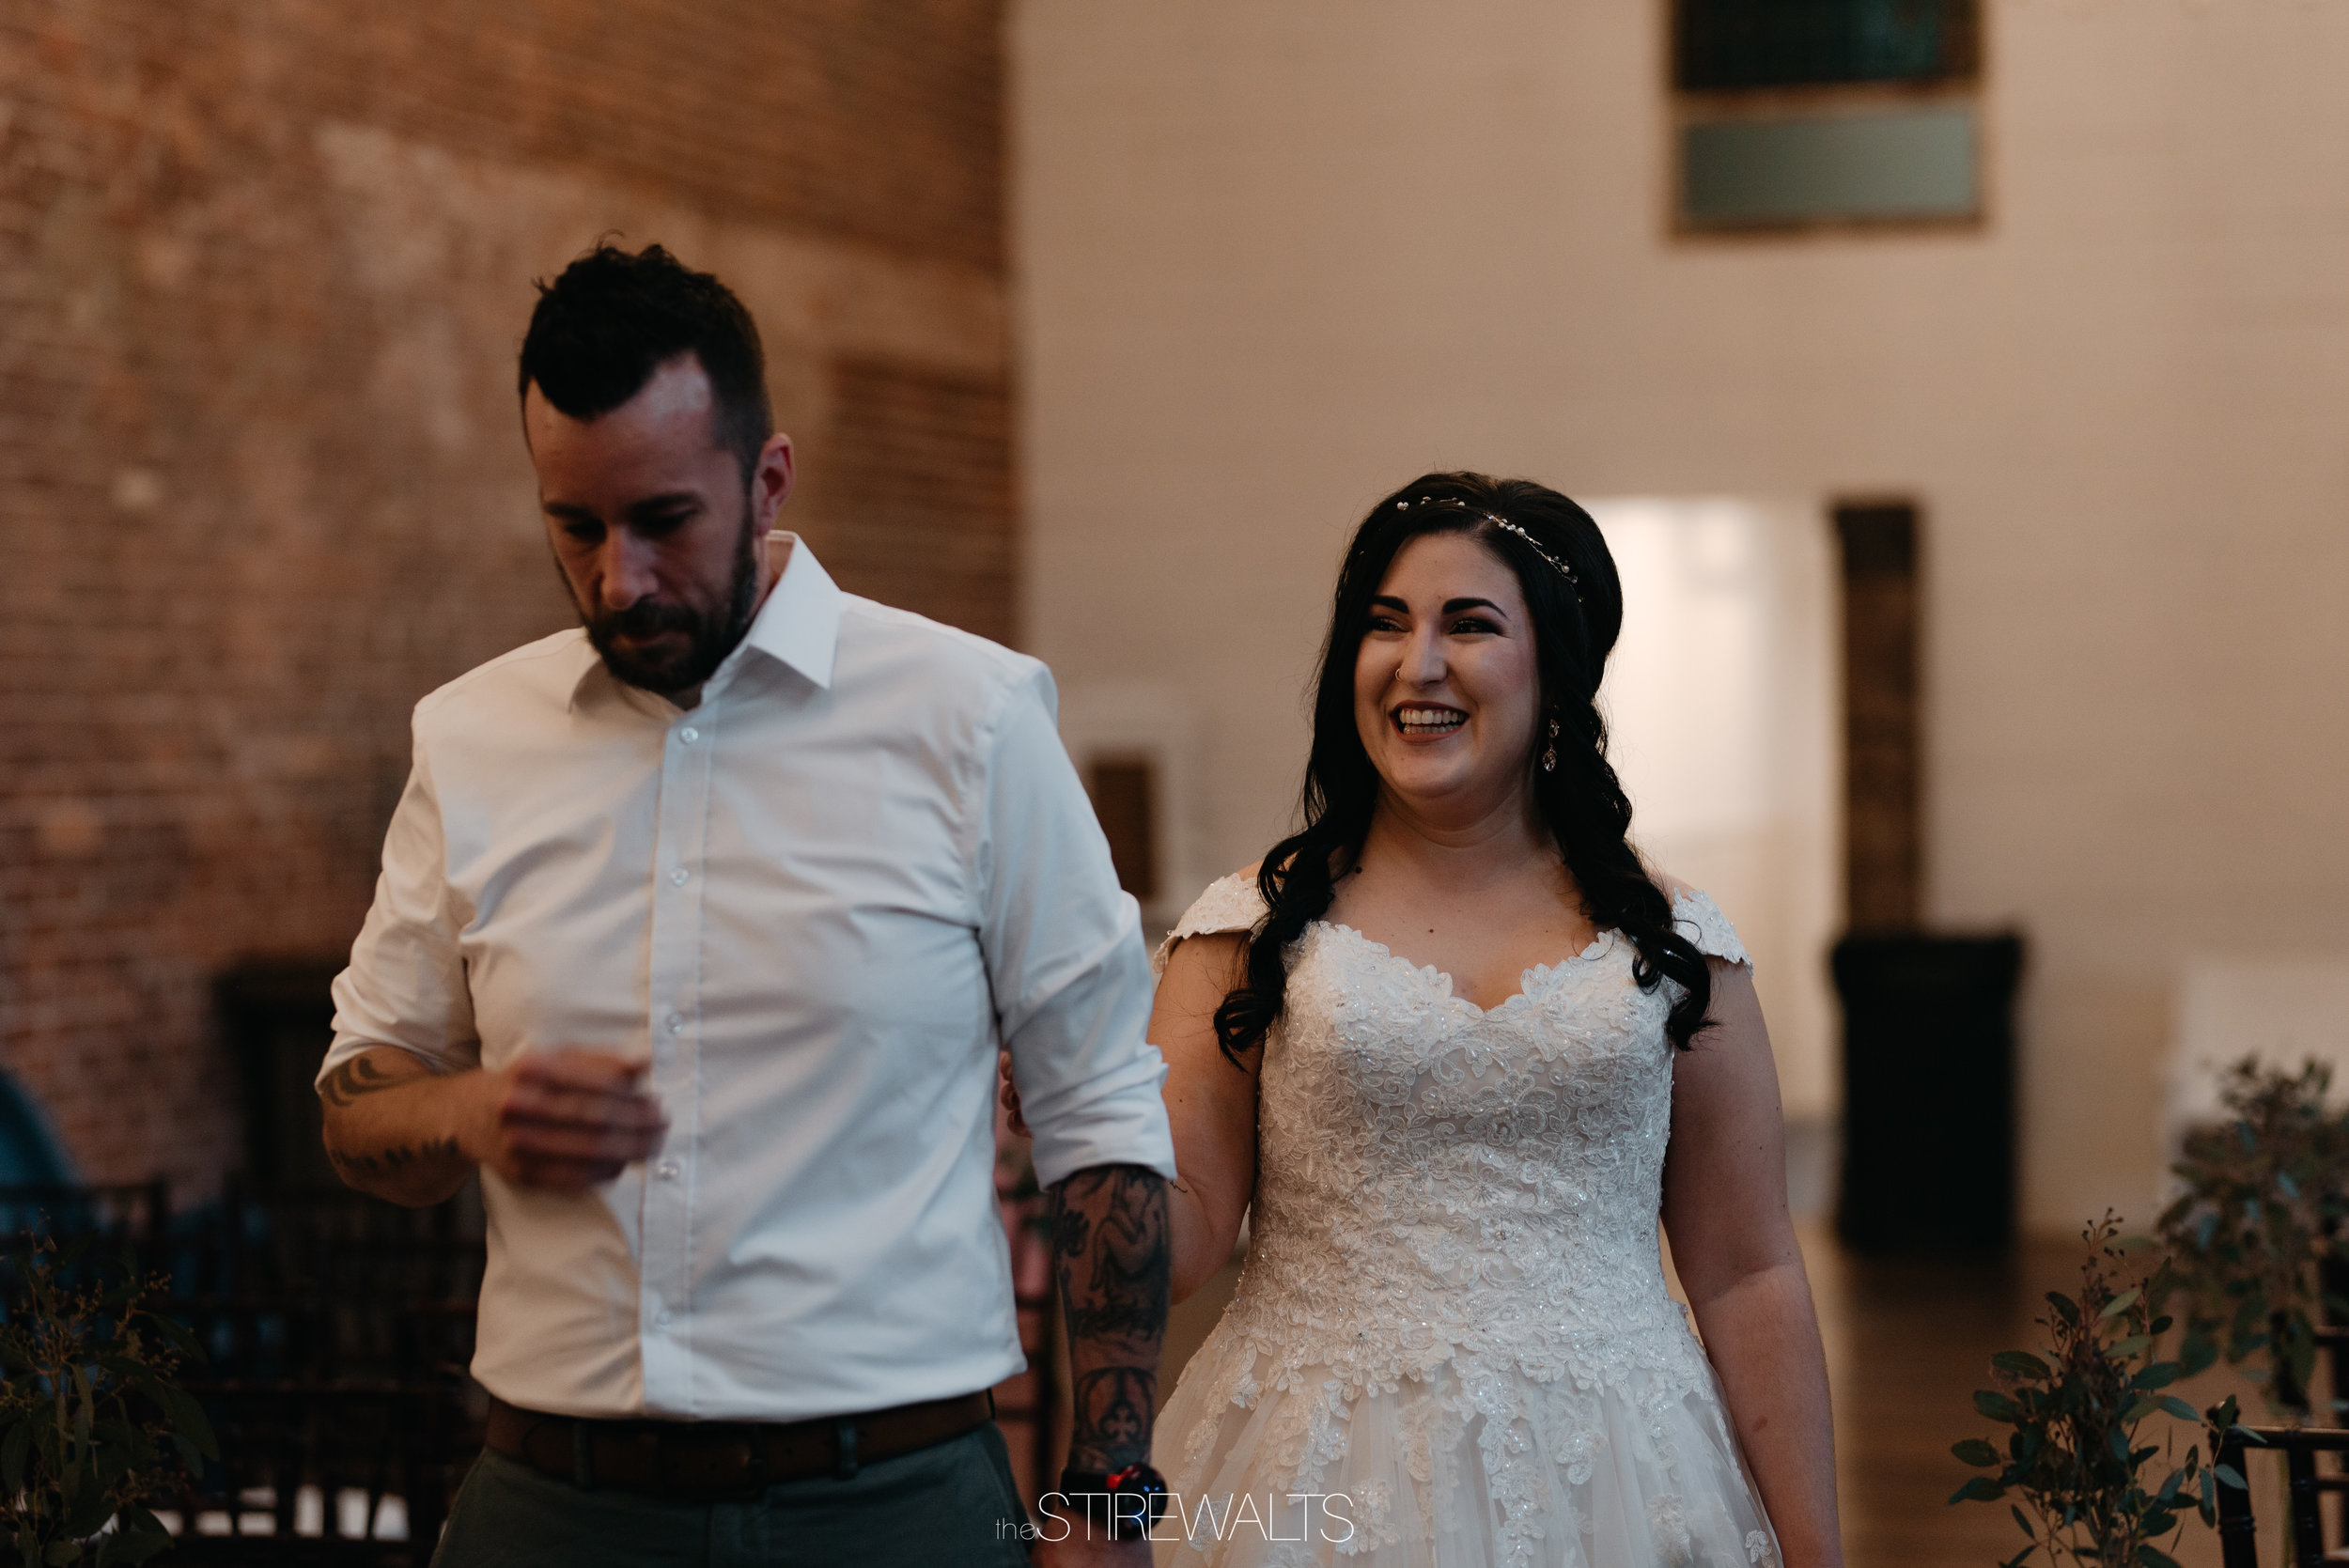 Sara.Jon.Wedding.Blog.2018.©TheStirewalts-30.jpg